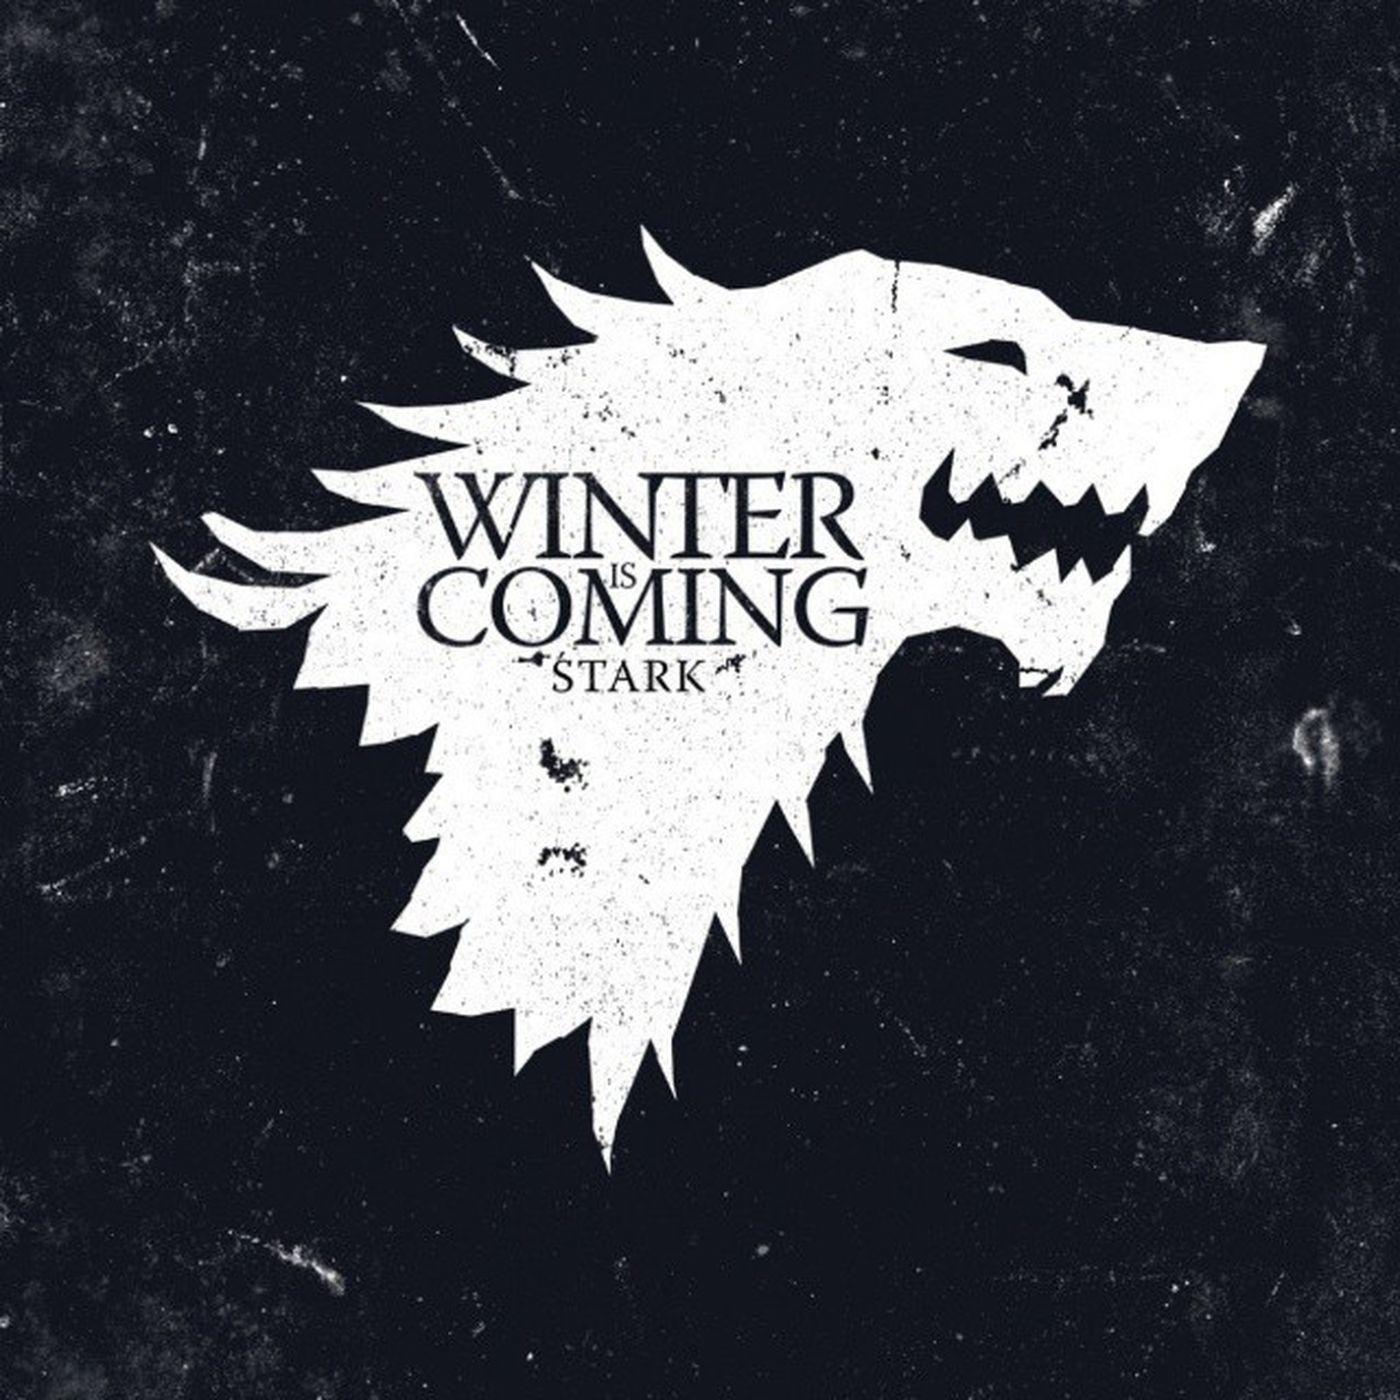 Winter is Coming!! ;-) Got Gameofthrones Winteriscoming Winter HBO Hottopics Cold Show Focus Imdb Season1 Game Thrones Life Violence Skyrim Irfan